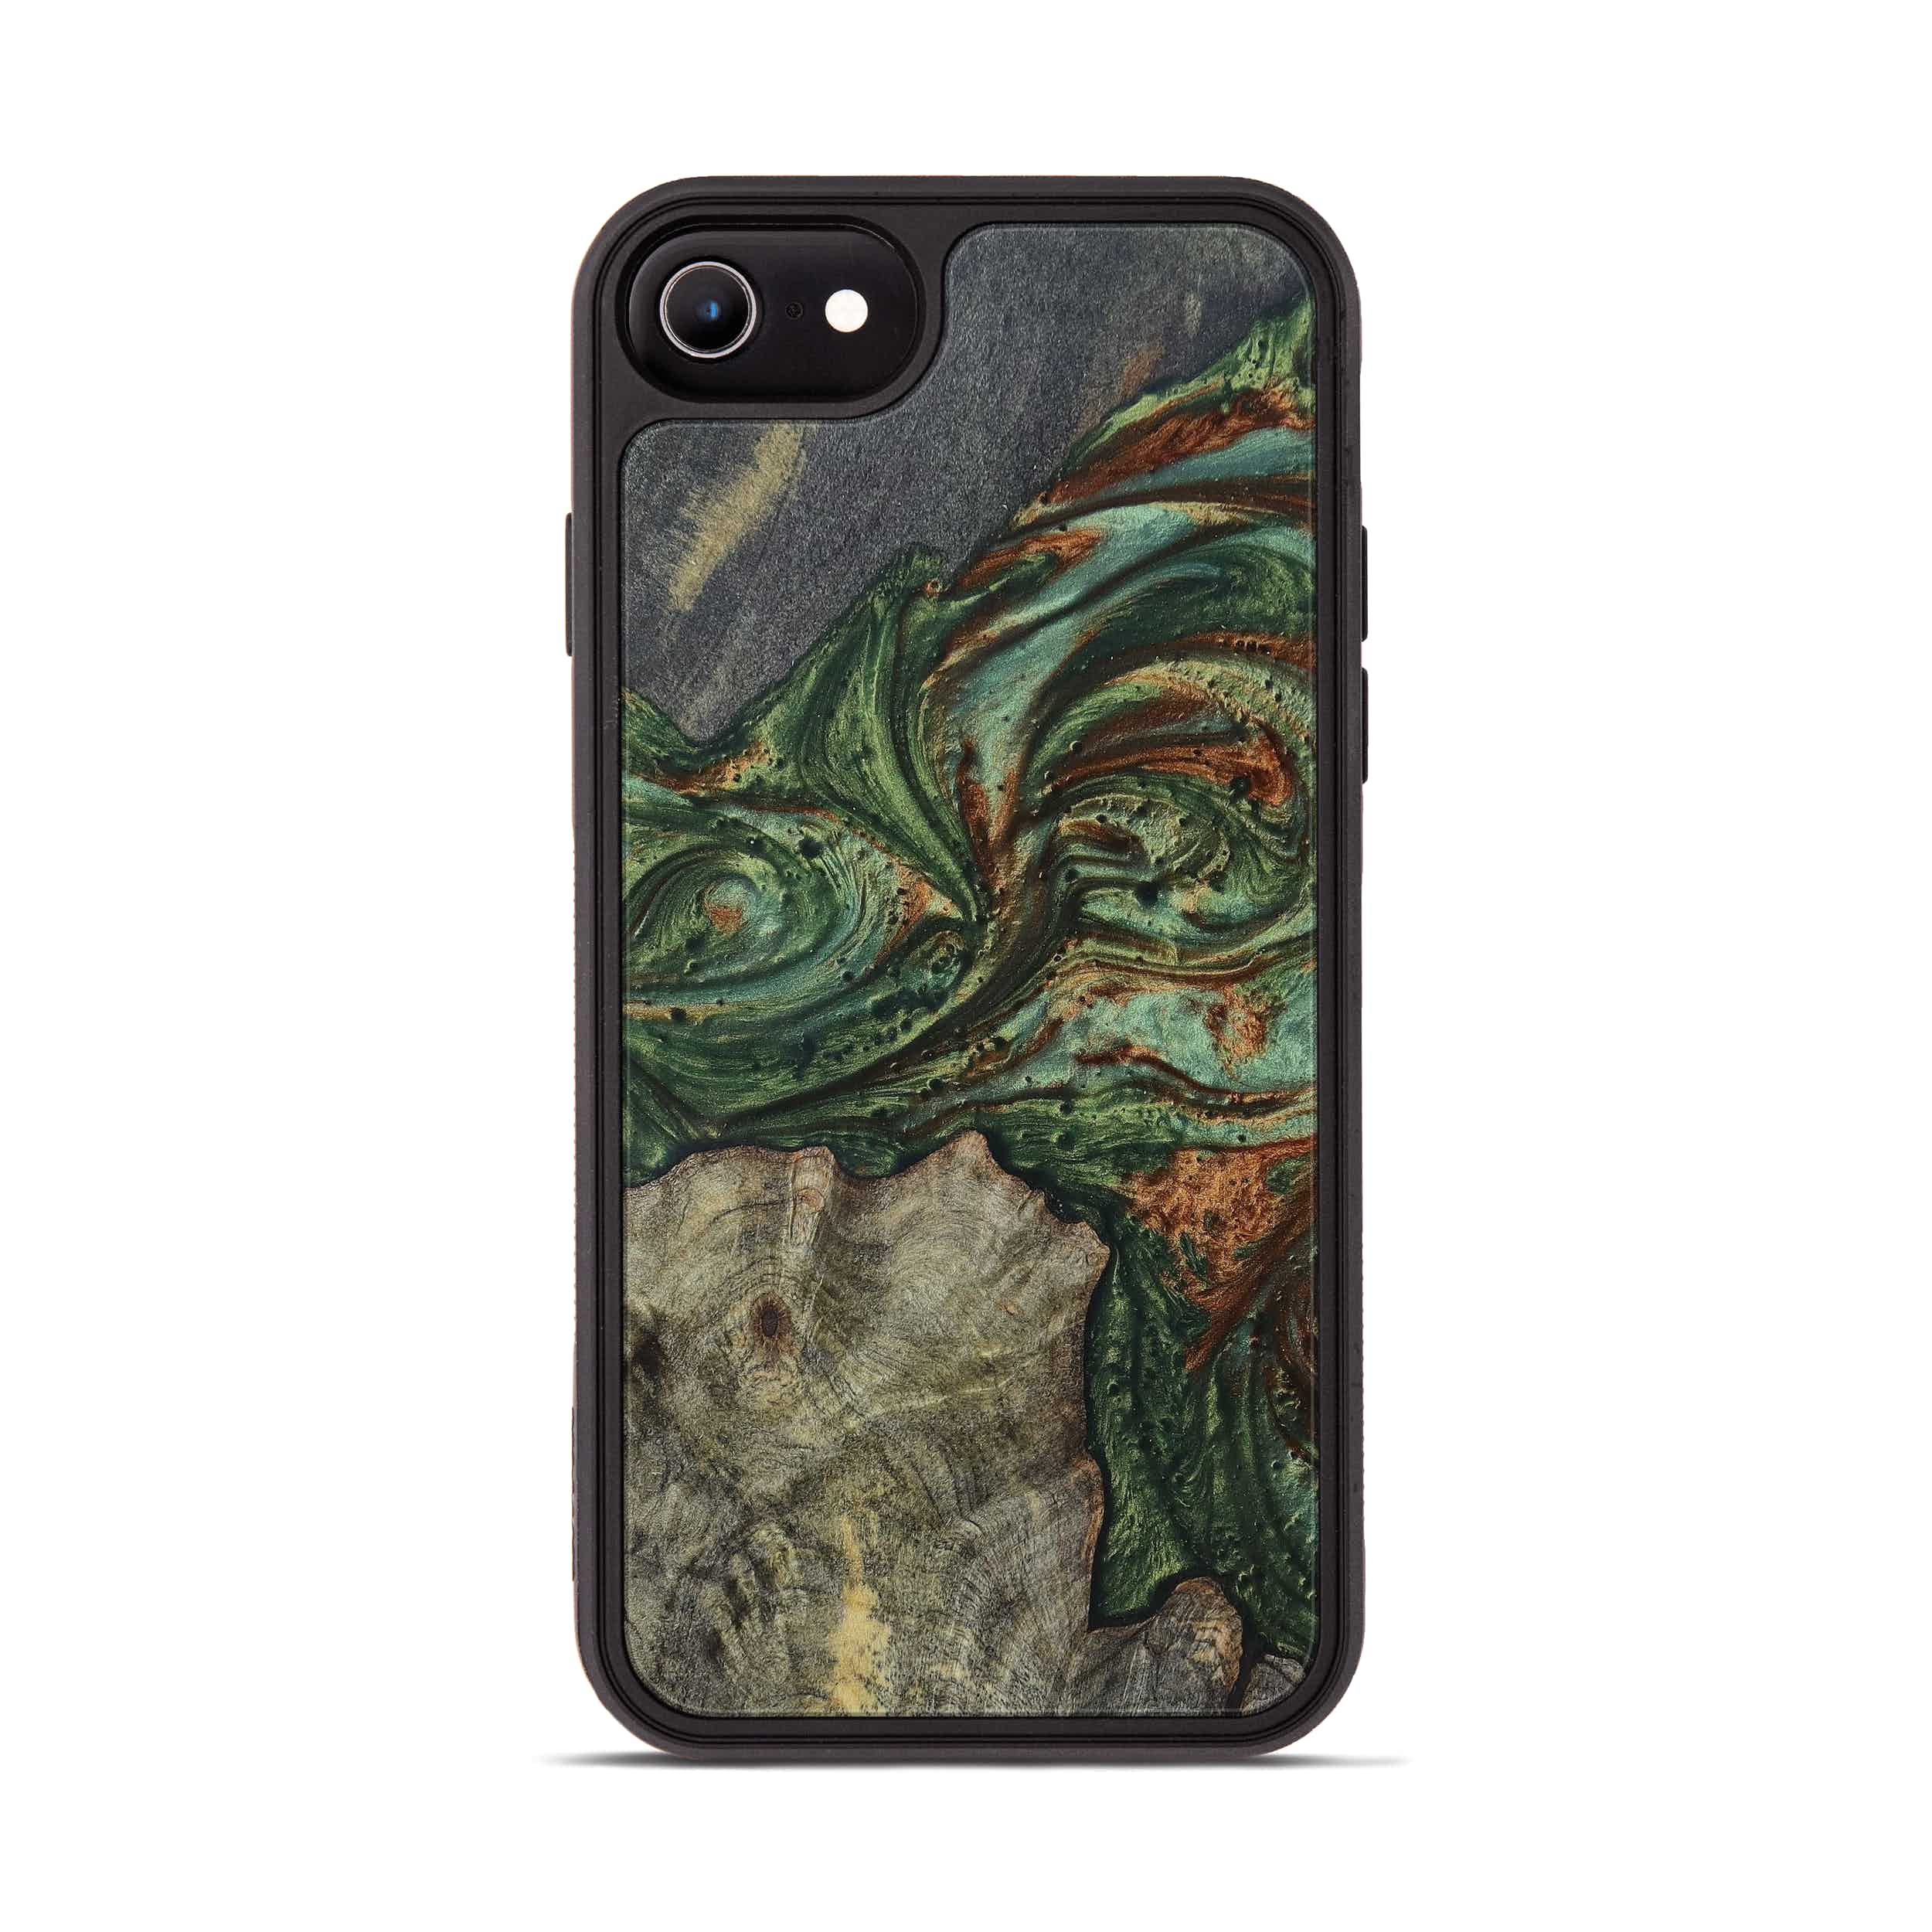 iPhone 8 Wood+Resin Phone Case - Frederica (Dark Green, 394752)